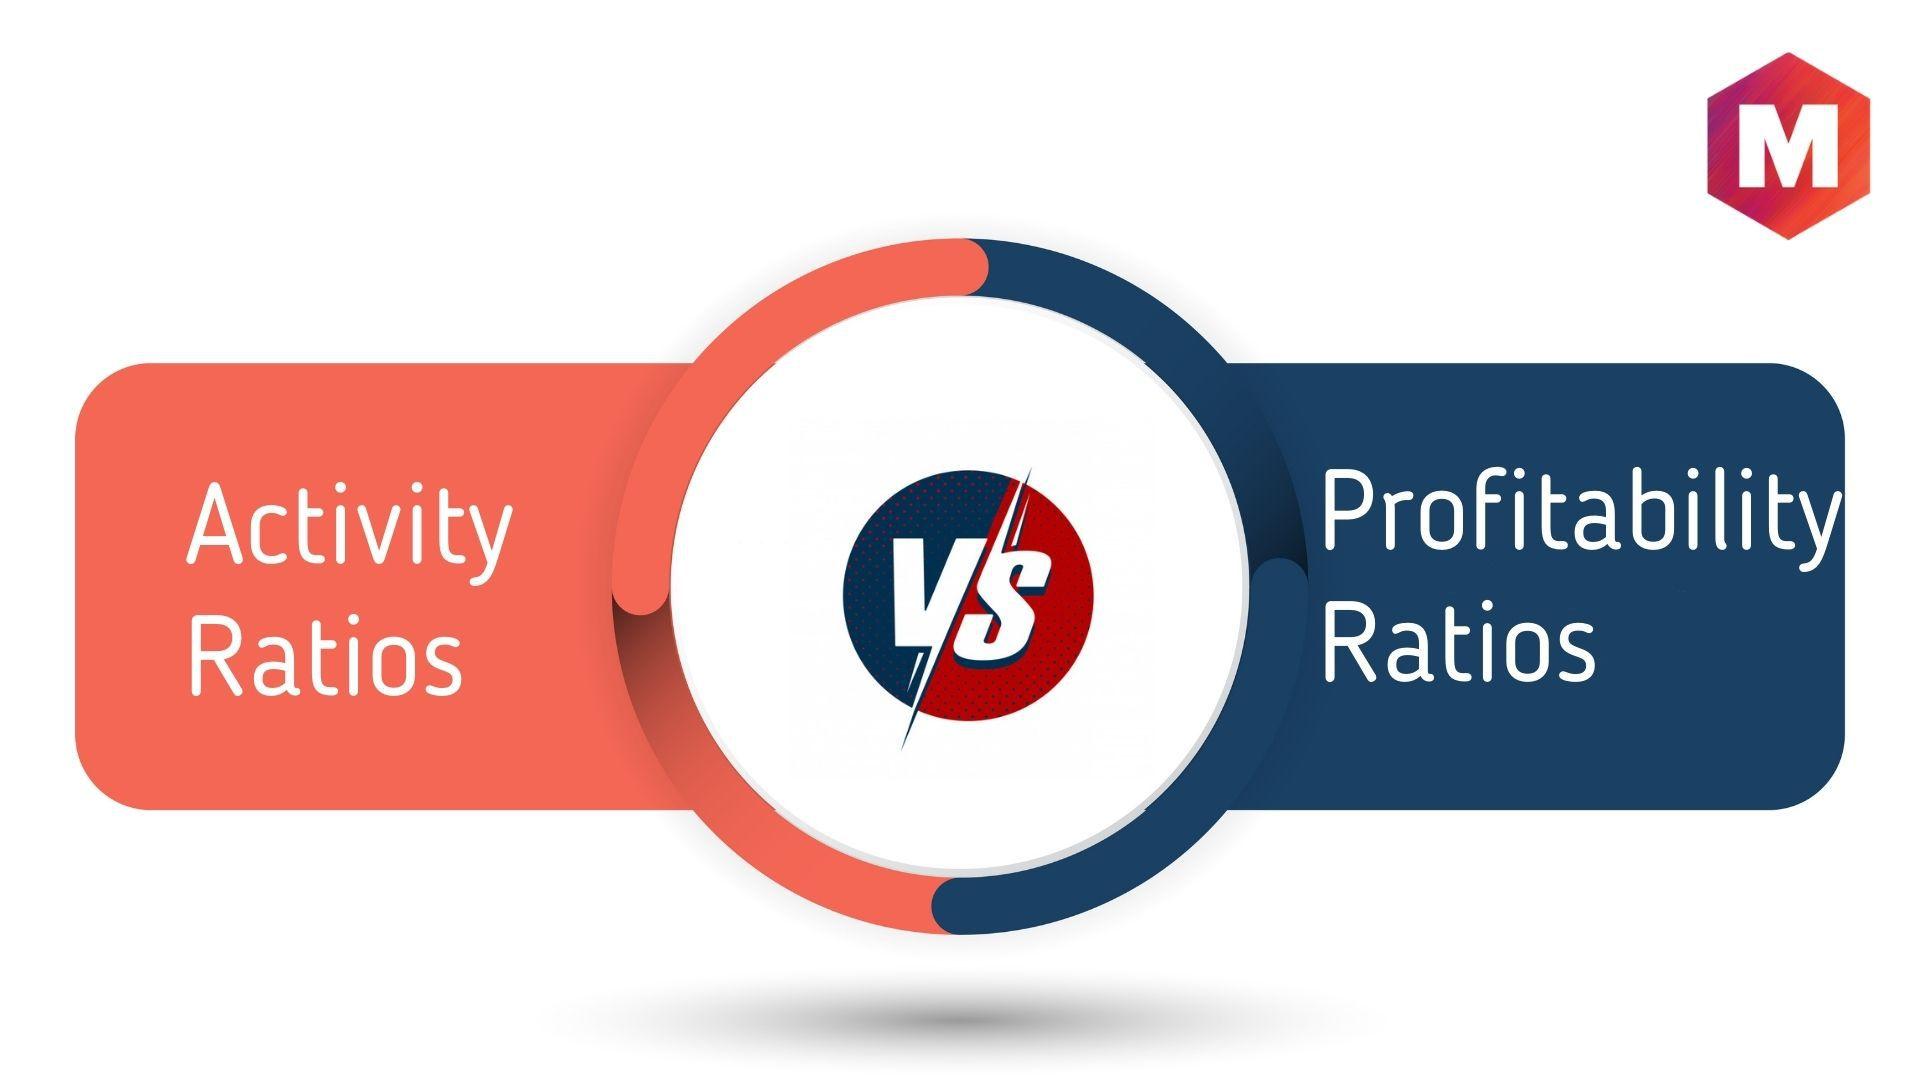 Activity Ratios Vs. Profitability Ratios